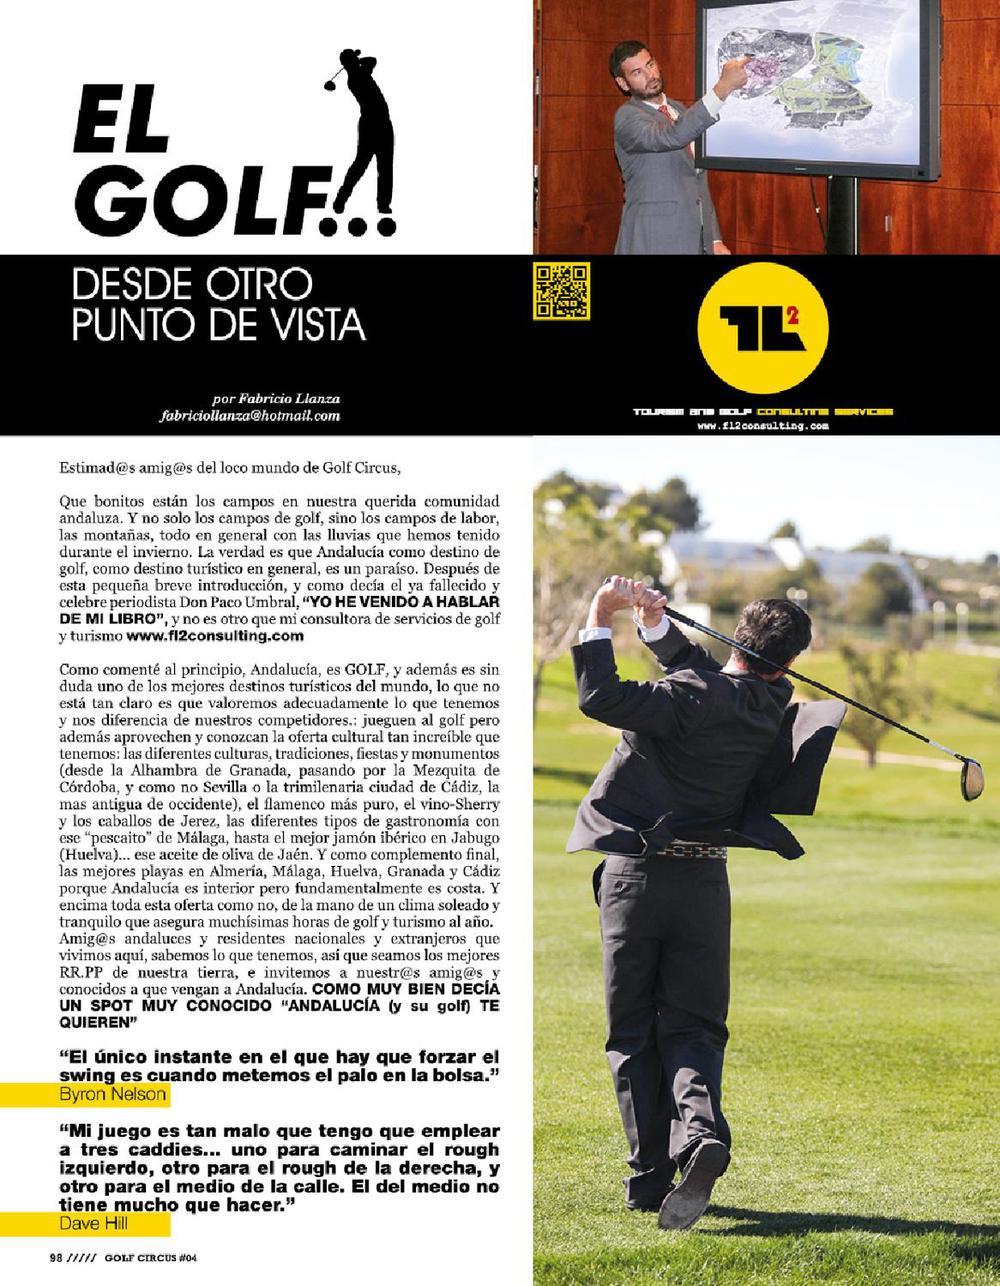 Golf Circus page_98.jpg